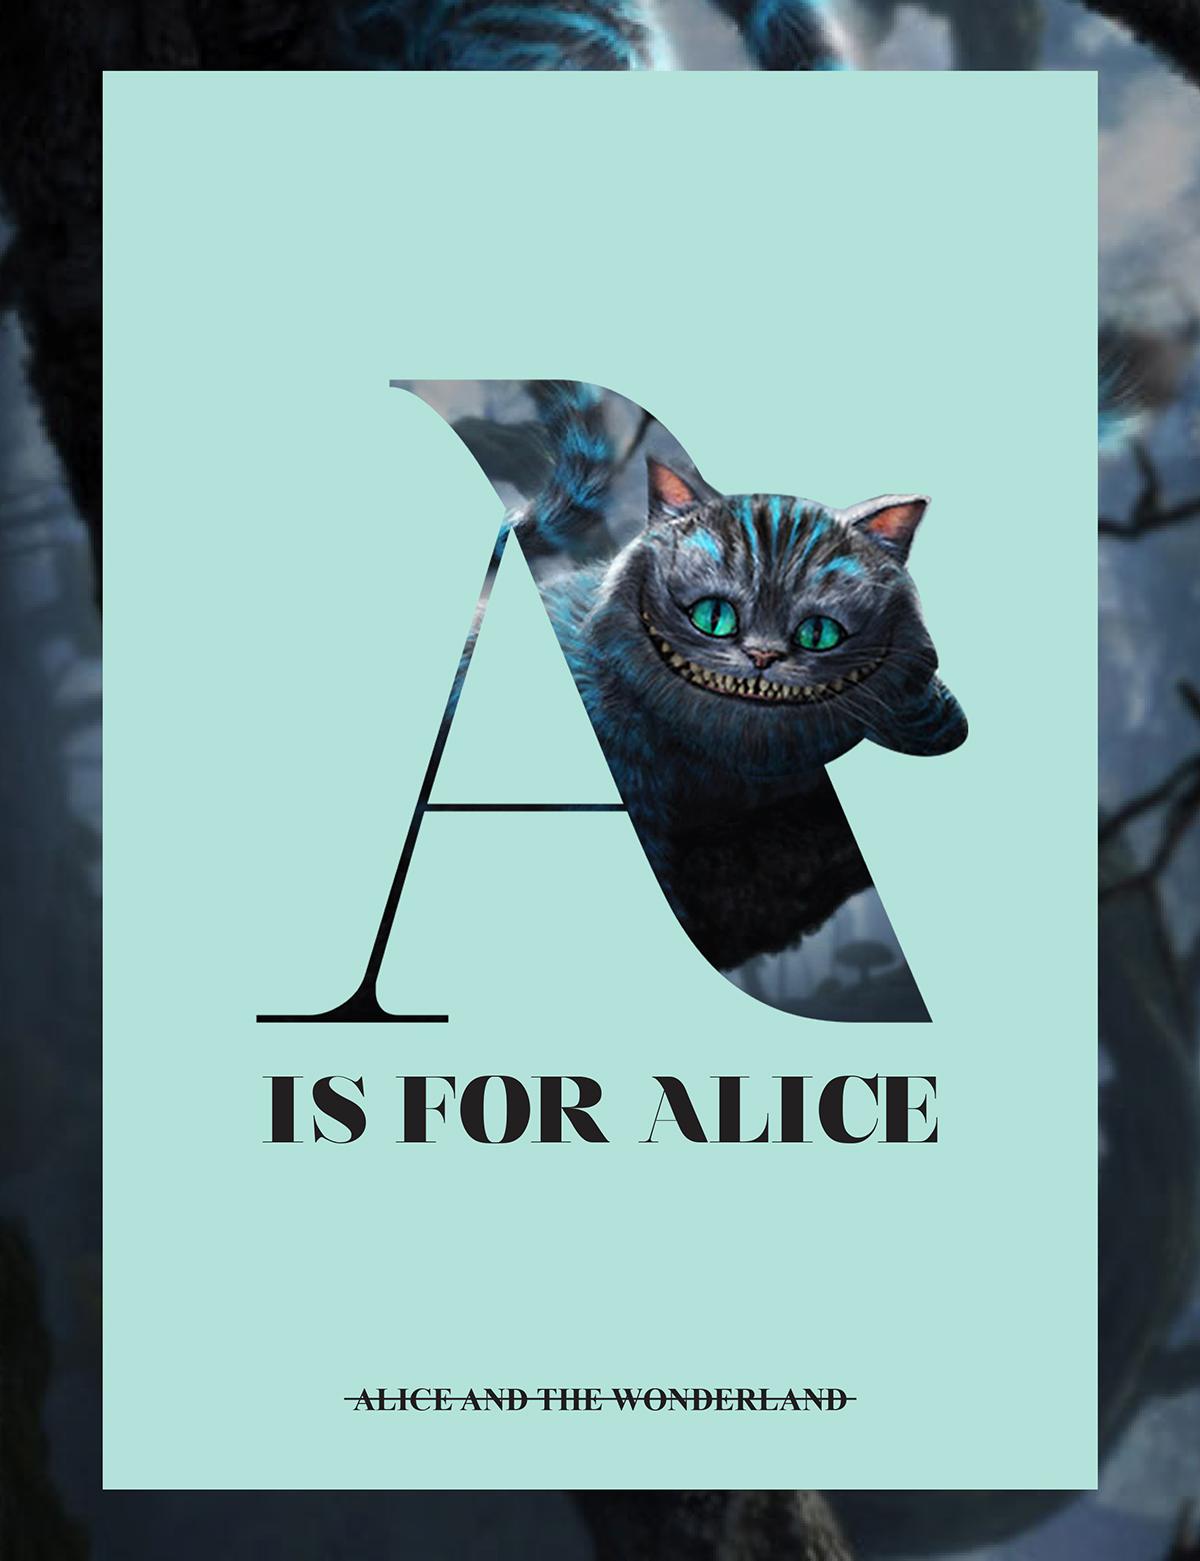 Alice In Wonderland Book Cover Ideas ~ Alice and the wonderland book cover on behance